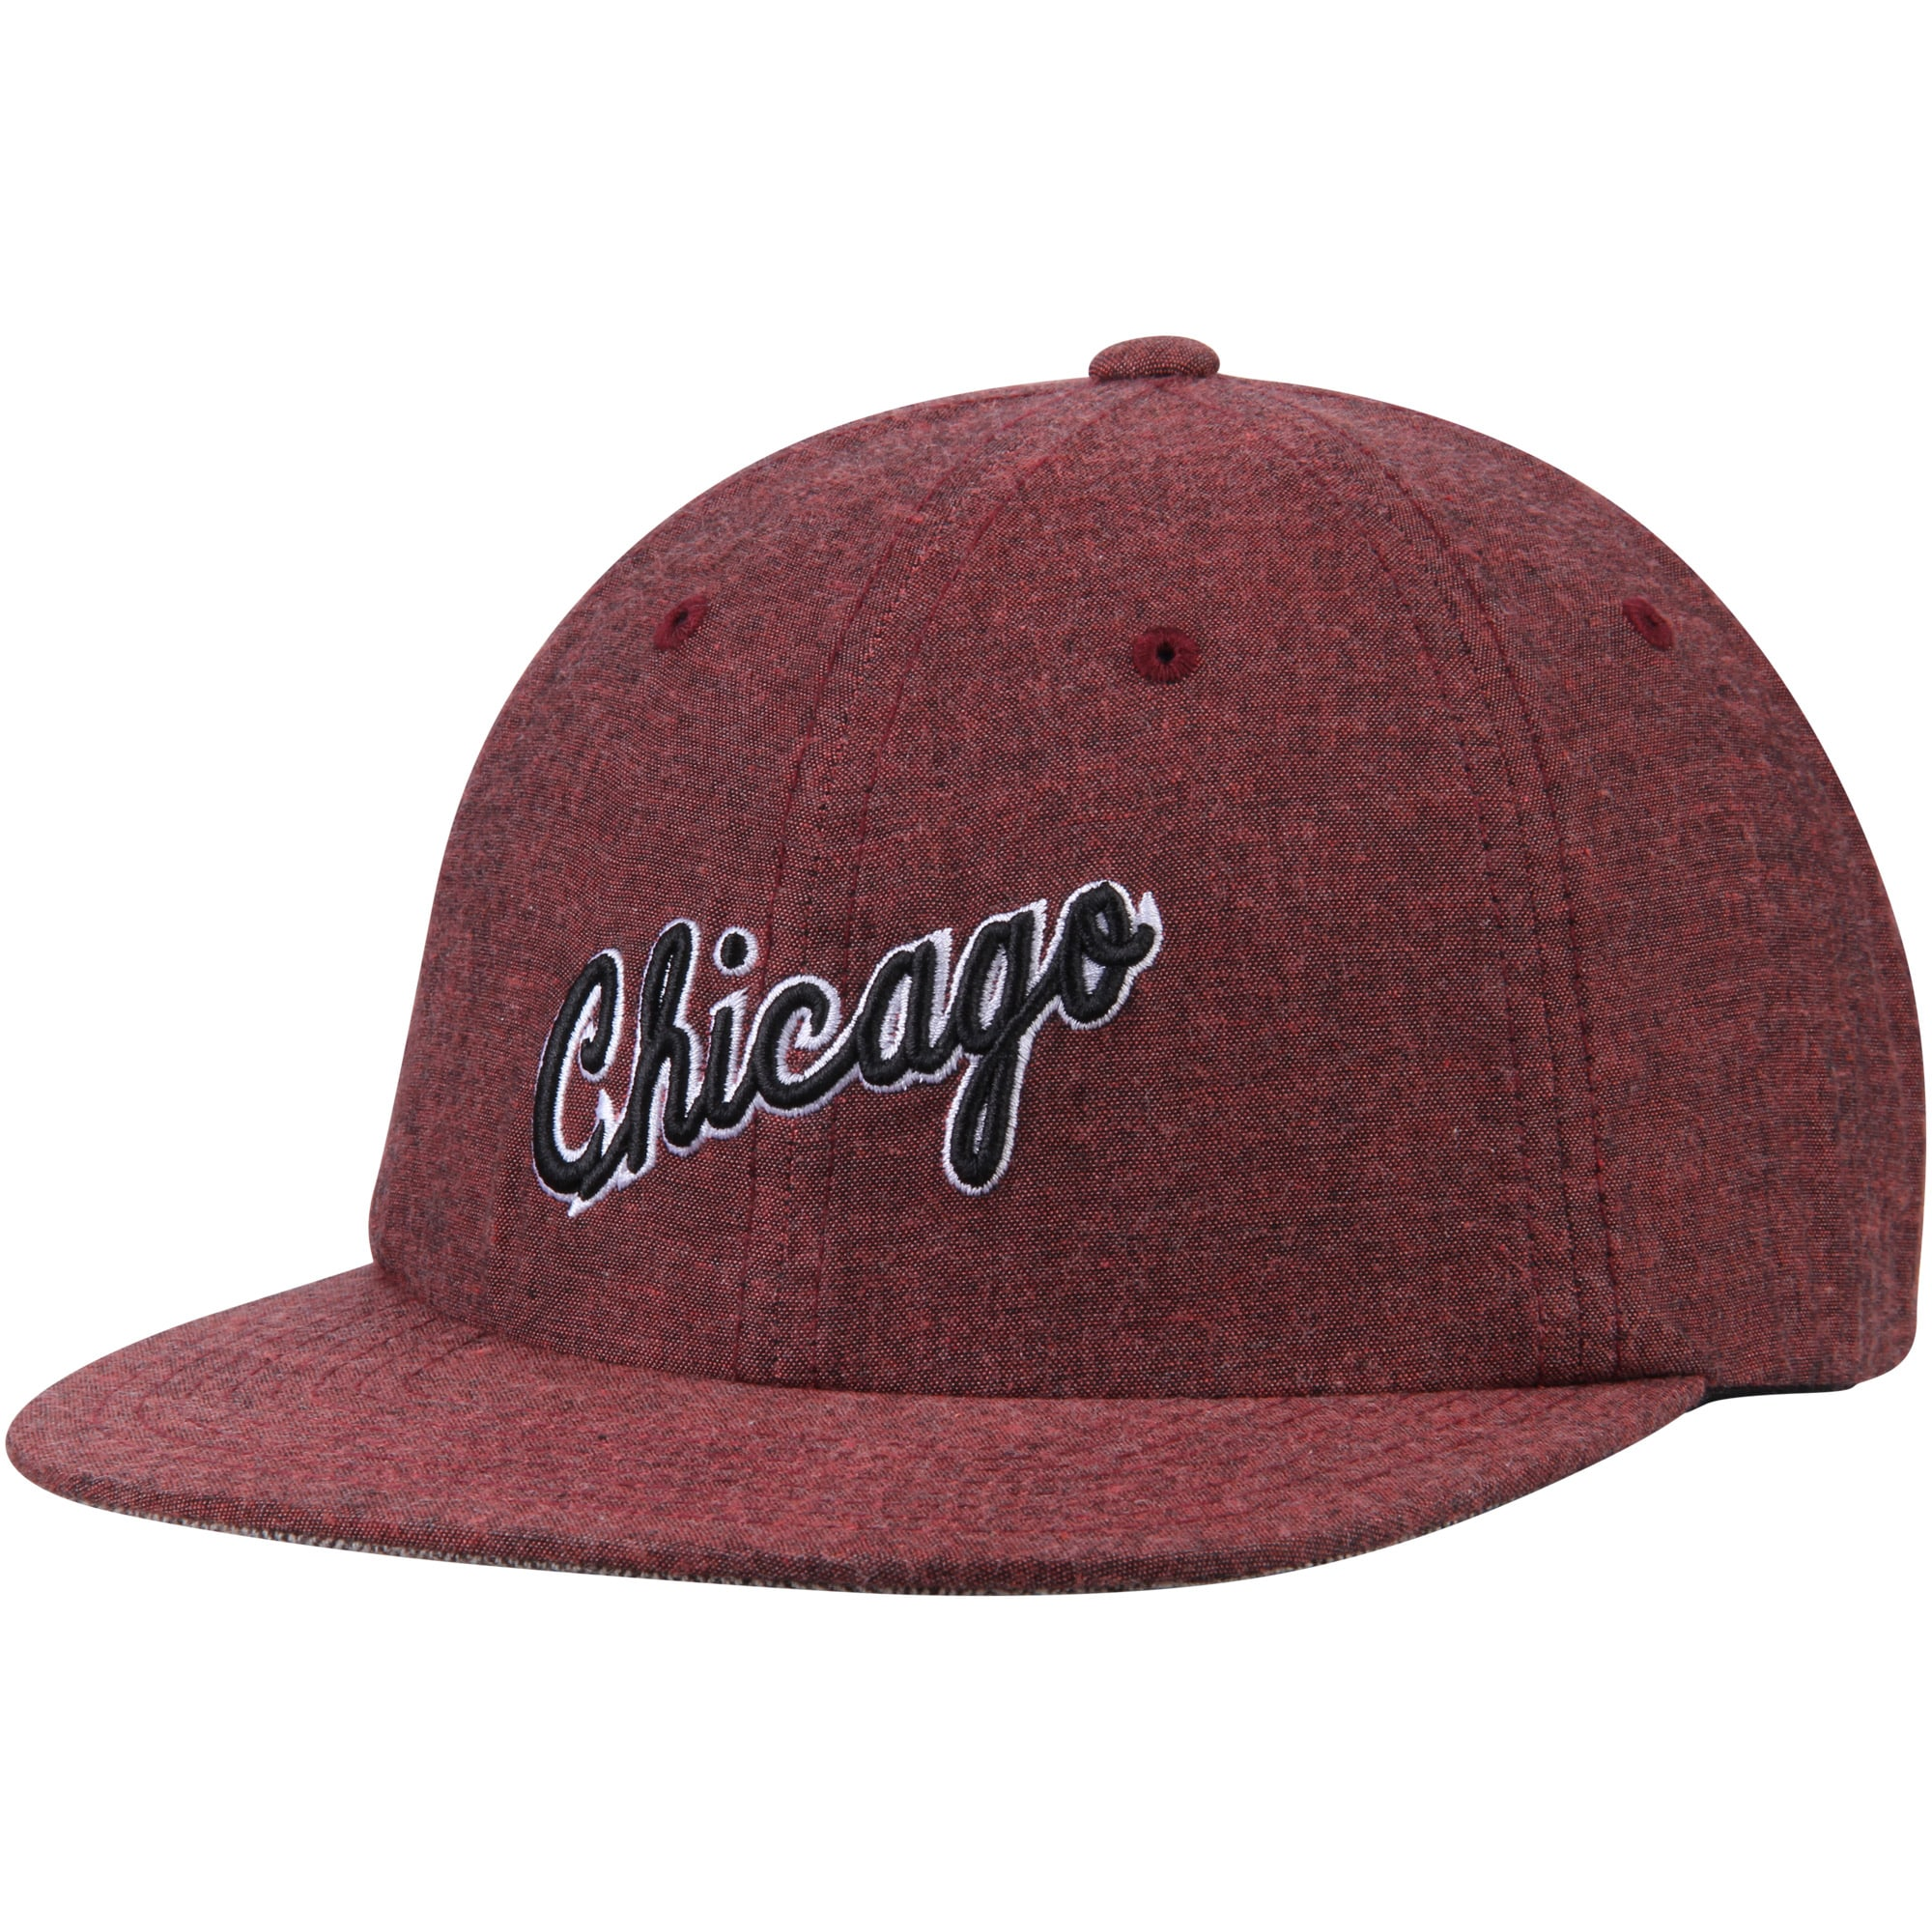 Chicago Bulls Mitchell & Ness Hardwood Classics Cotton Melange Clip Strapback Adjustable Hat - Heathered Red